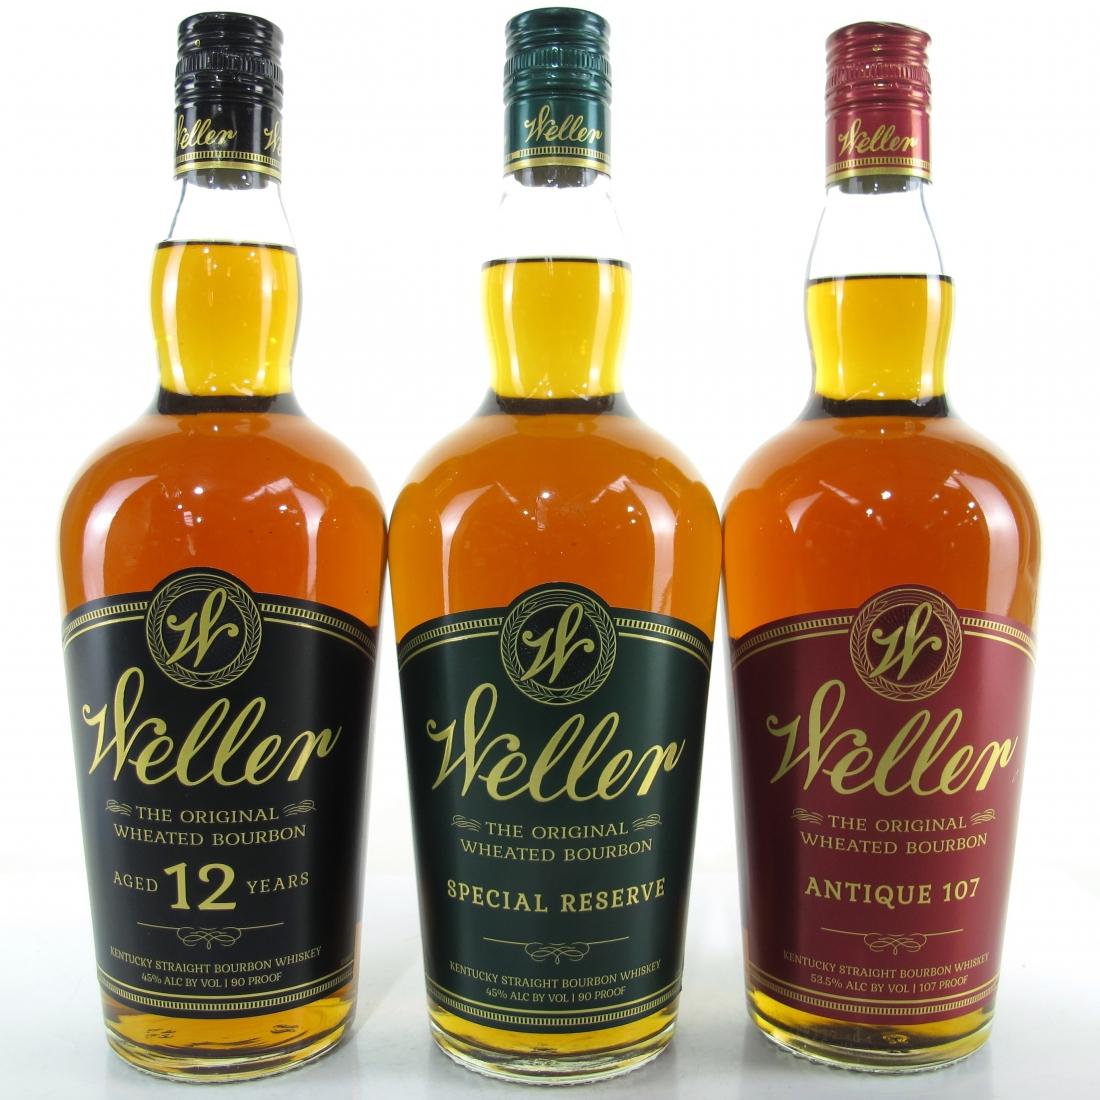 Weller Selection / 3 x 75cl